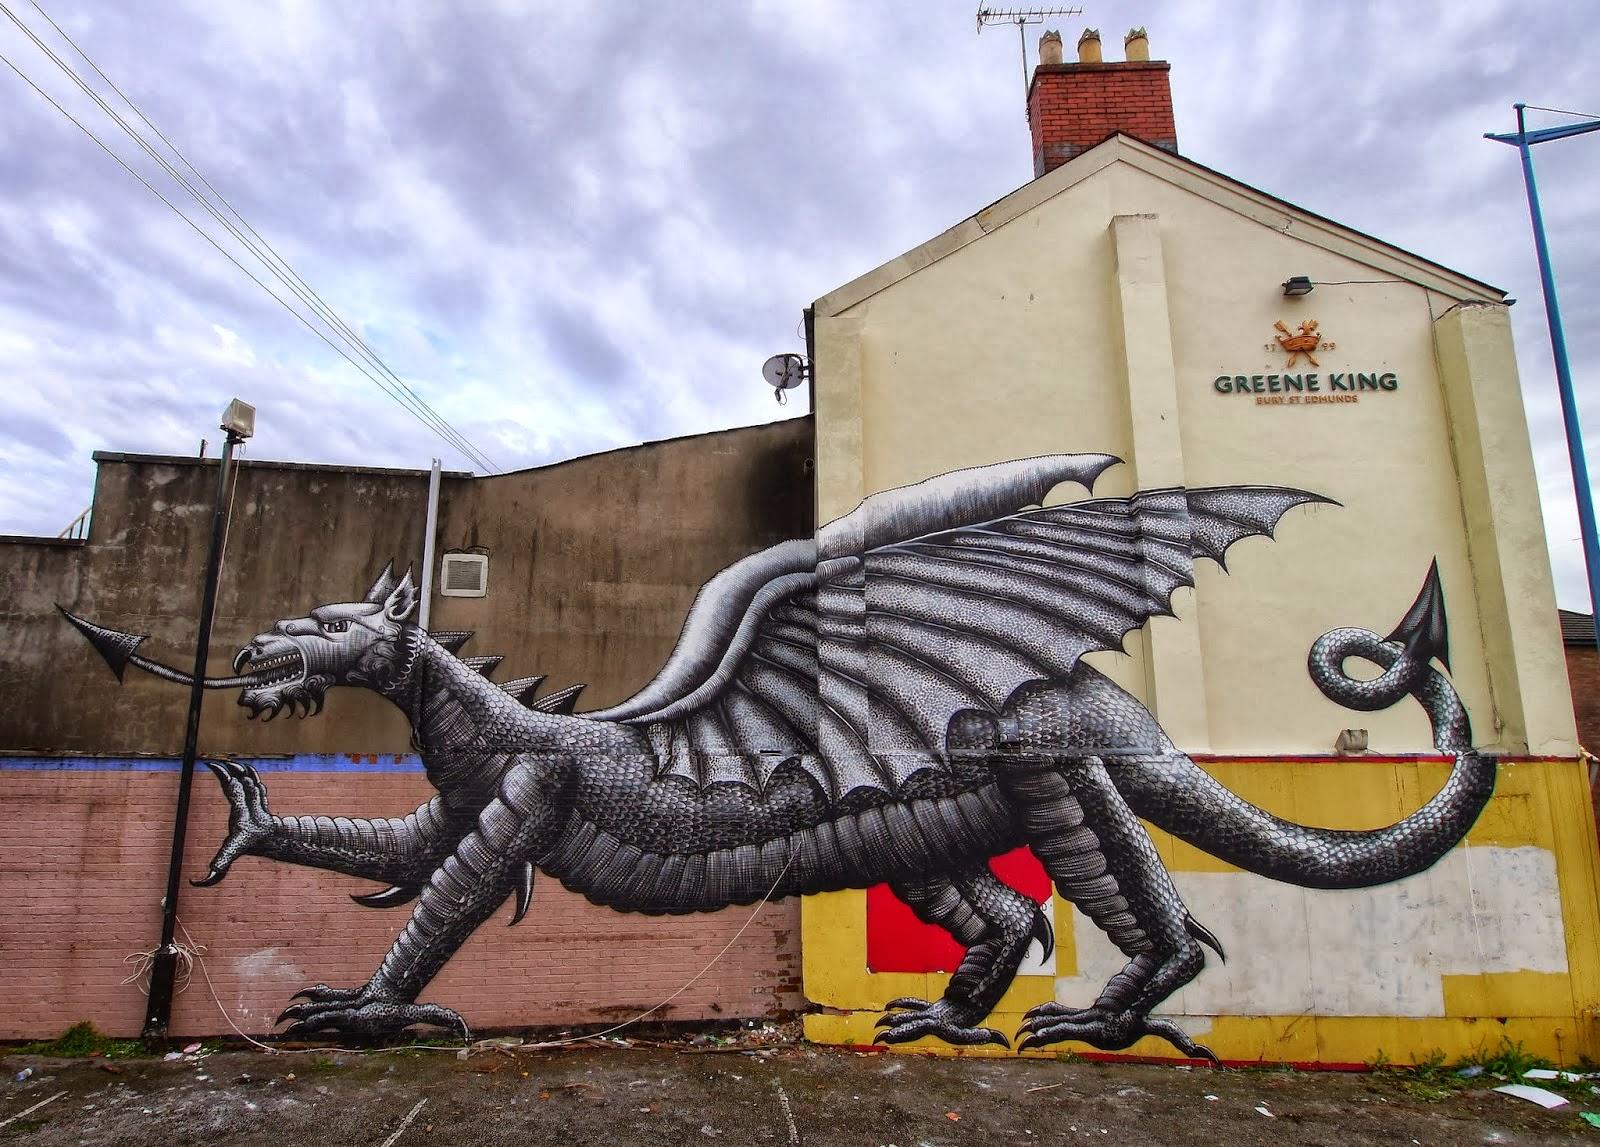 Stunning Street Art By Phlegm For Empty Walls Urban Art Festival In Cardiff Wales